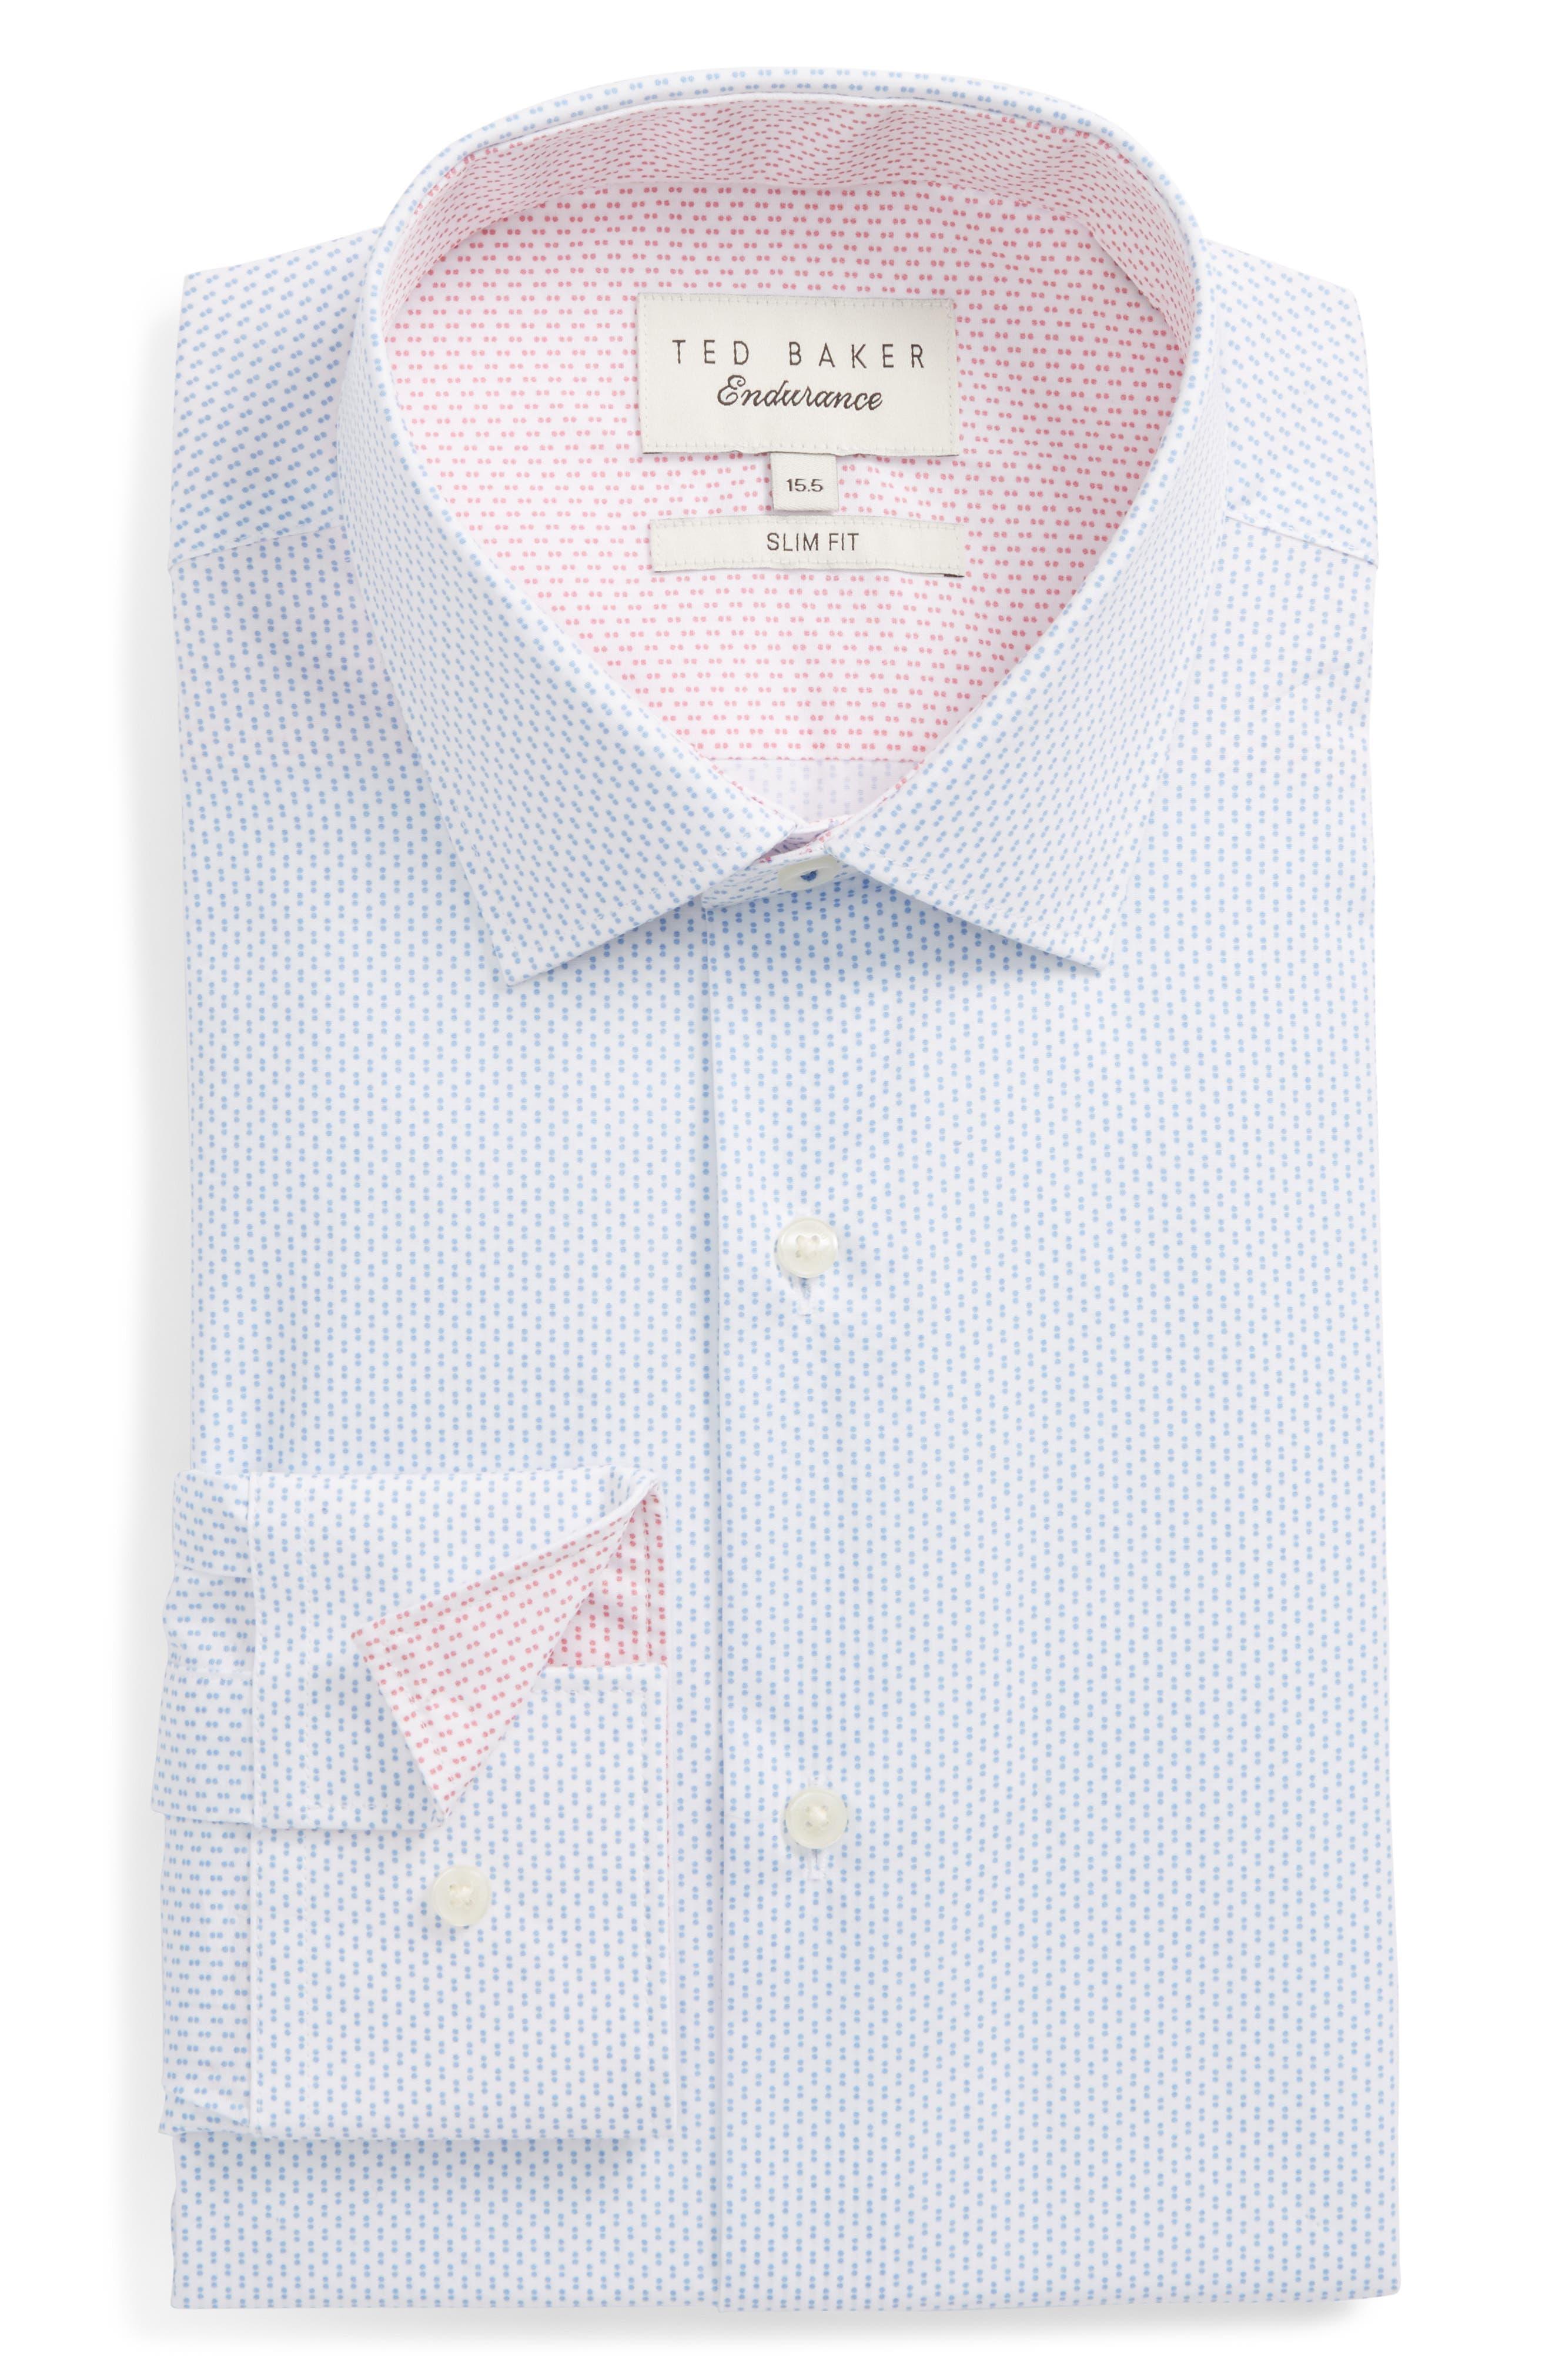 Endurance Barged Slim Fit Double Dot Dress Shirt,                         Main,                         color, Blue